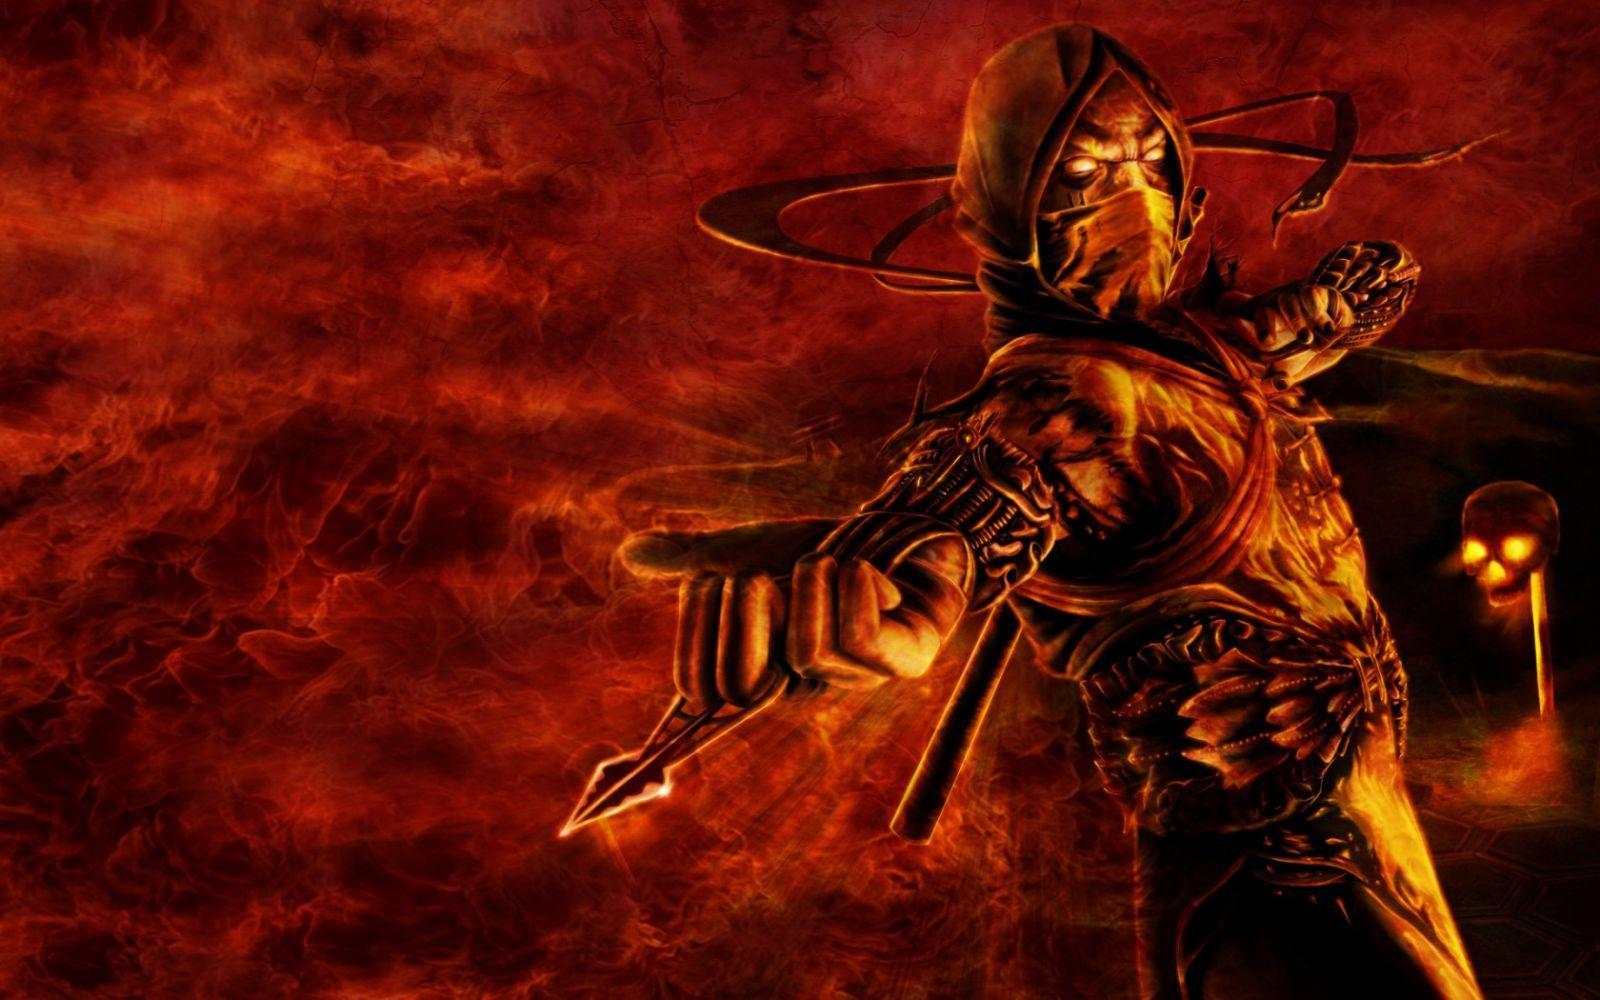 Mortal Kombat 11 Hd Wallpapers Scorpion Mortal Kombat Mortal Kombat Hd Wallpaper